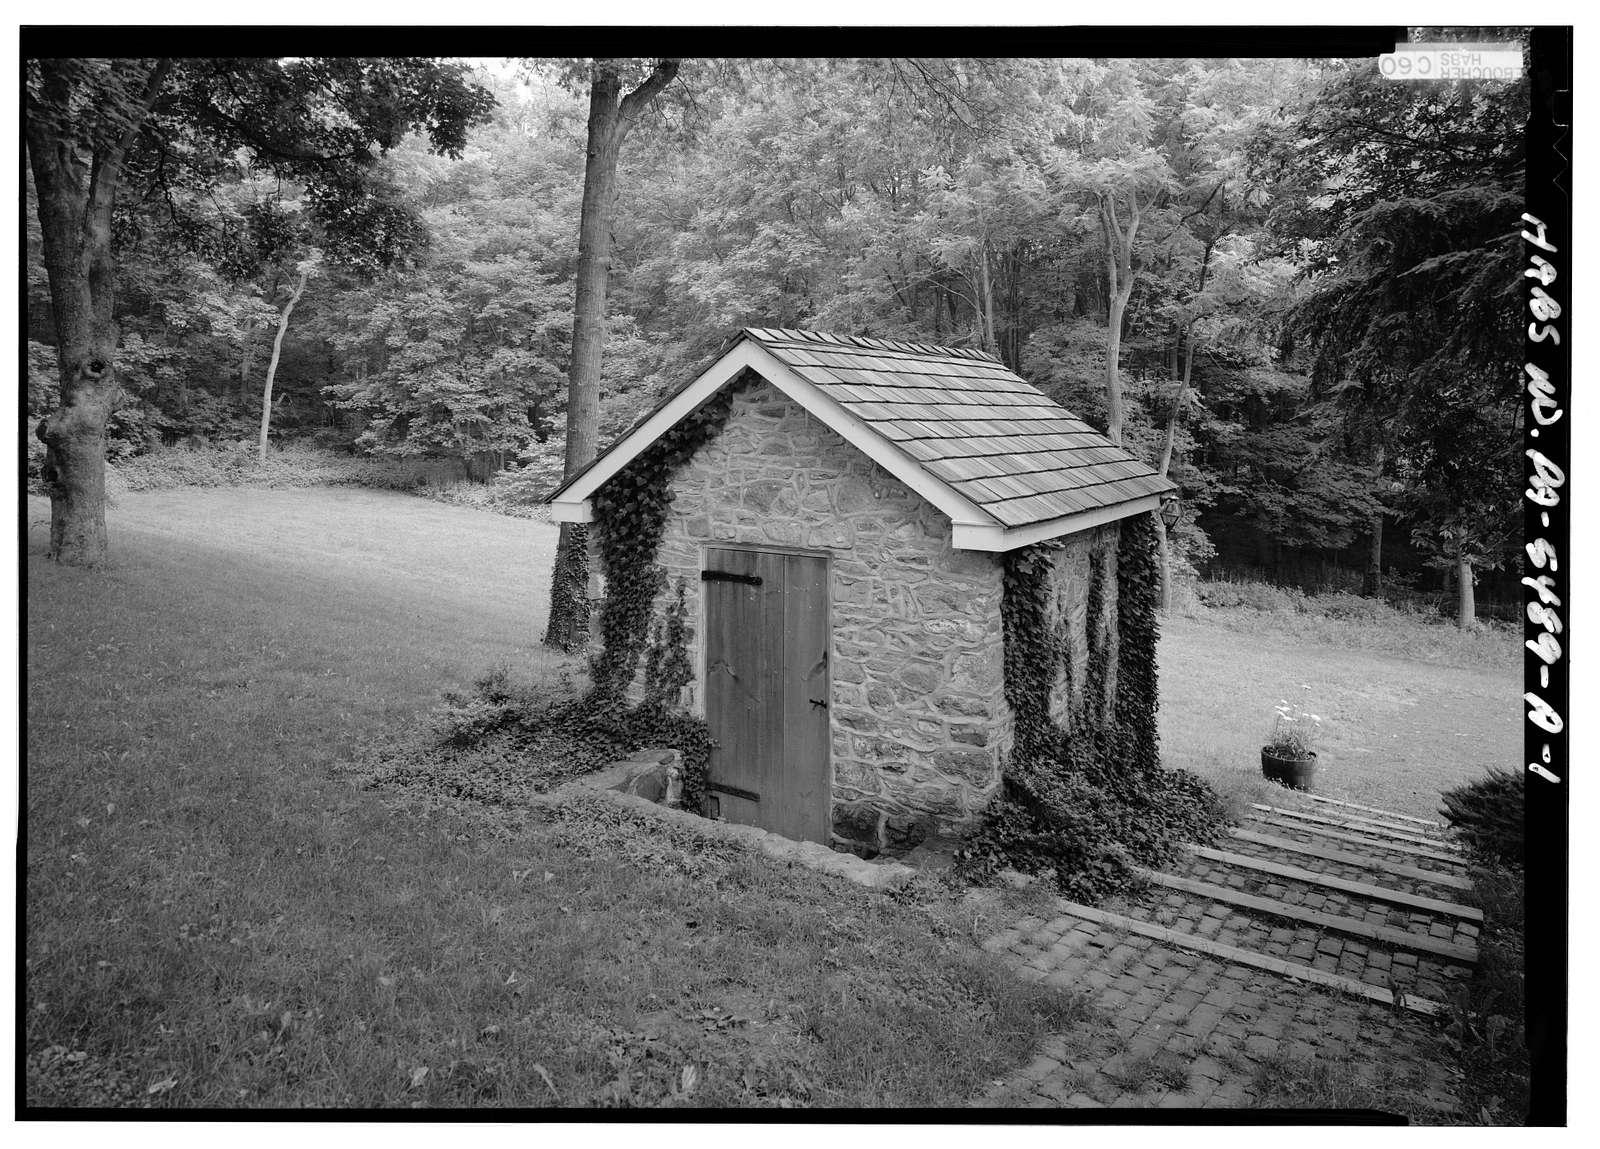 Edgemont, Spring House, 212 Bridgetown Pike, Woodbourne, Bucks County, PA